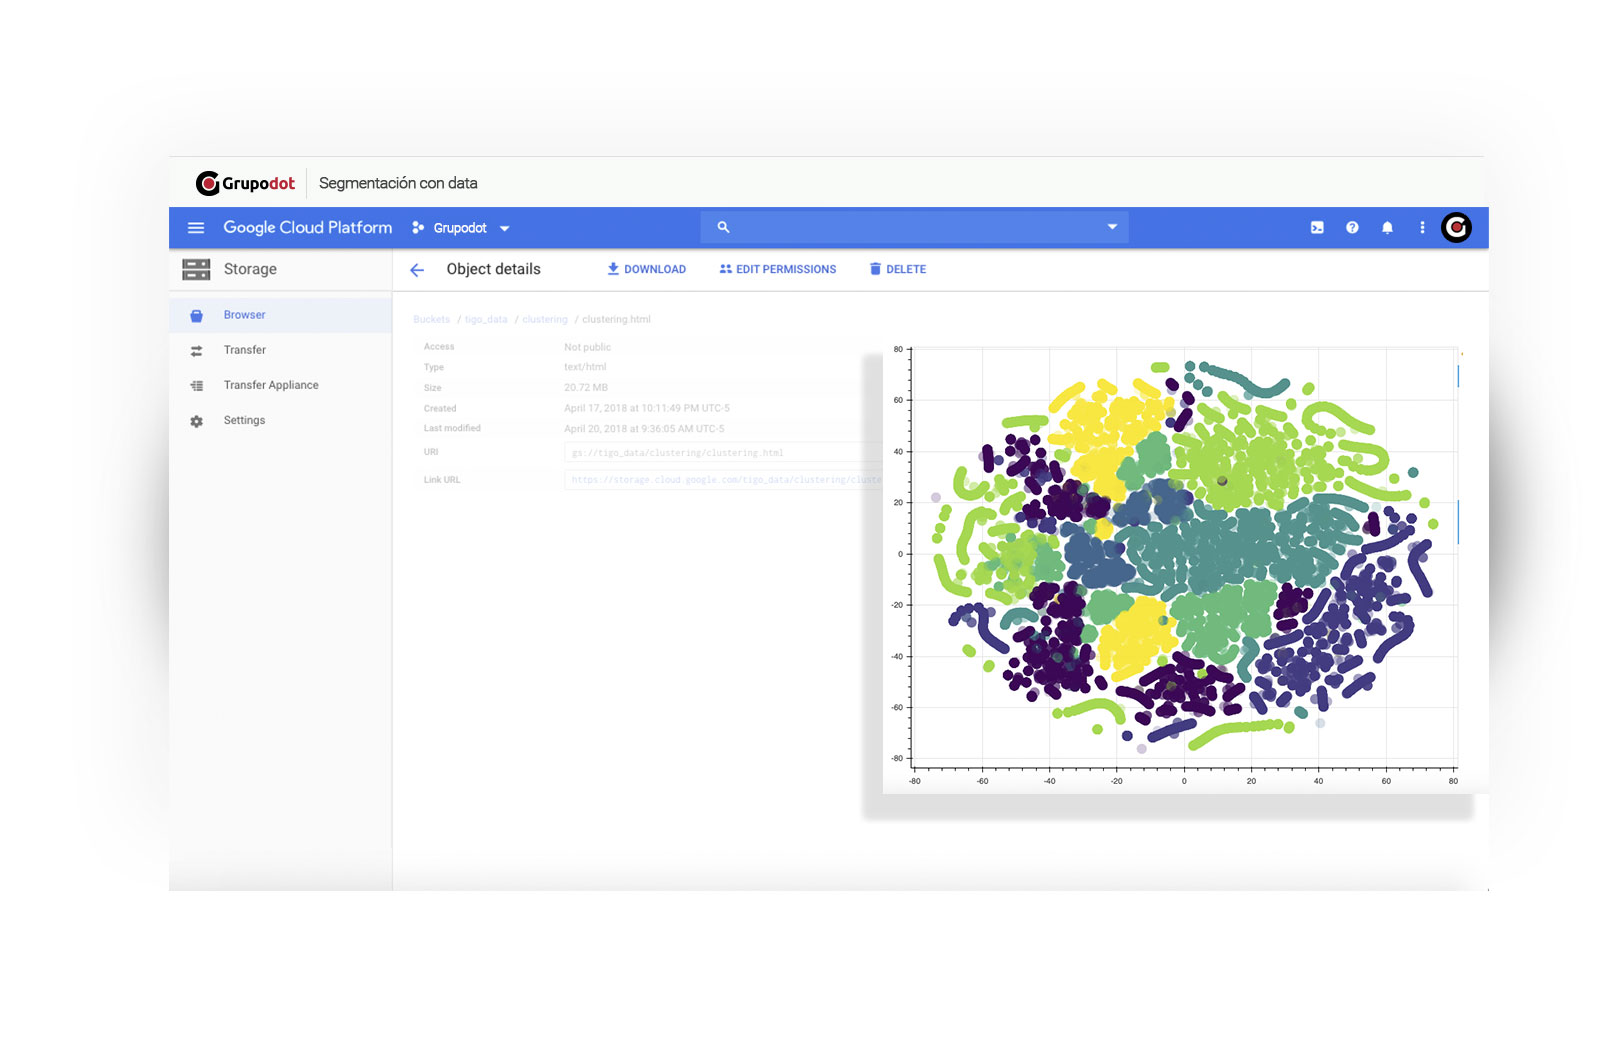 Segmentation with data